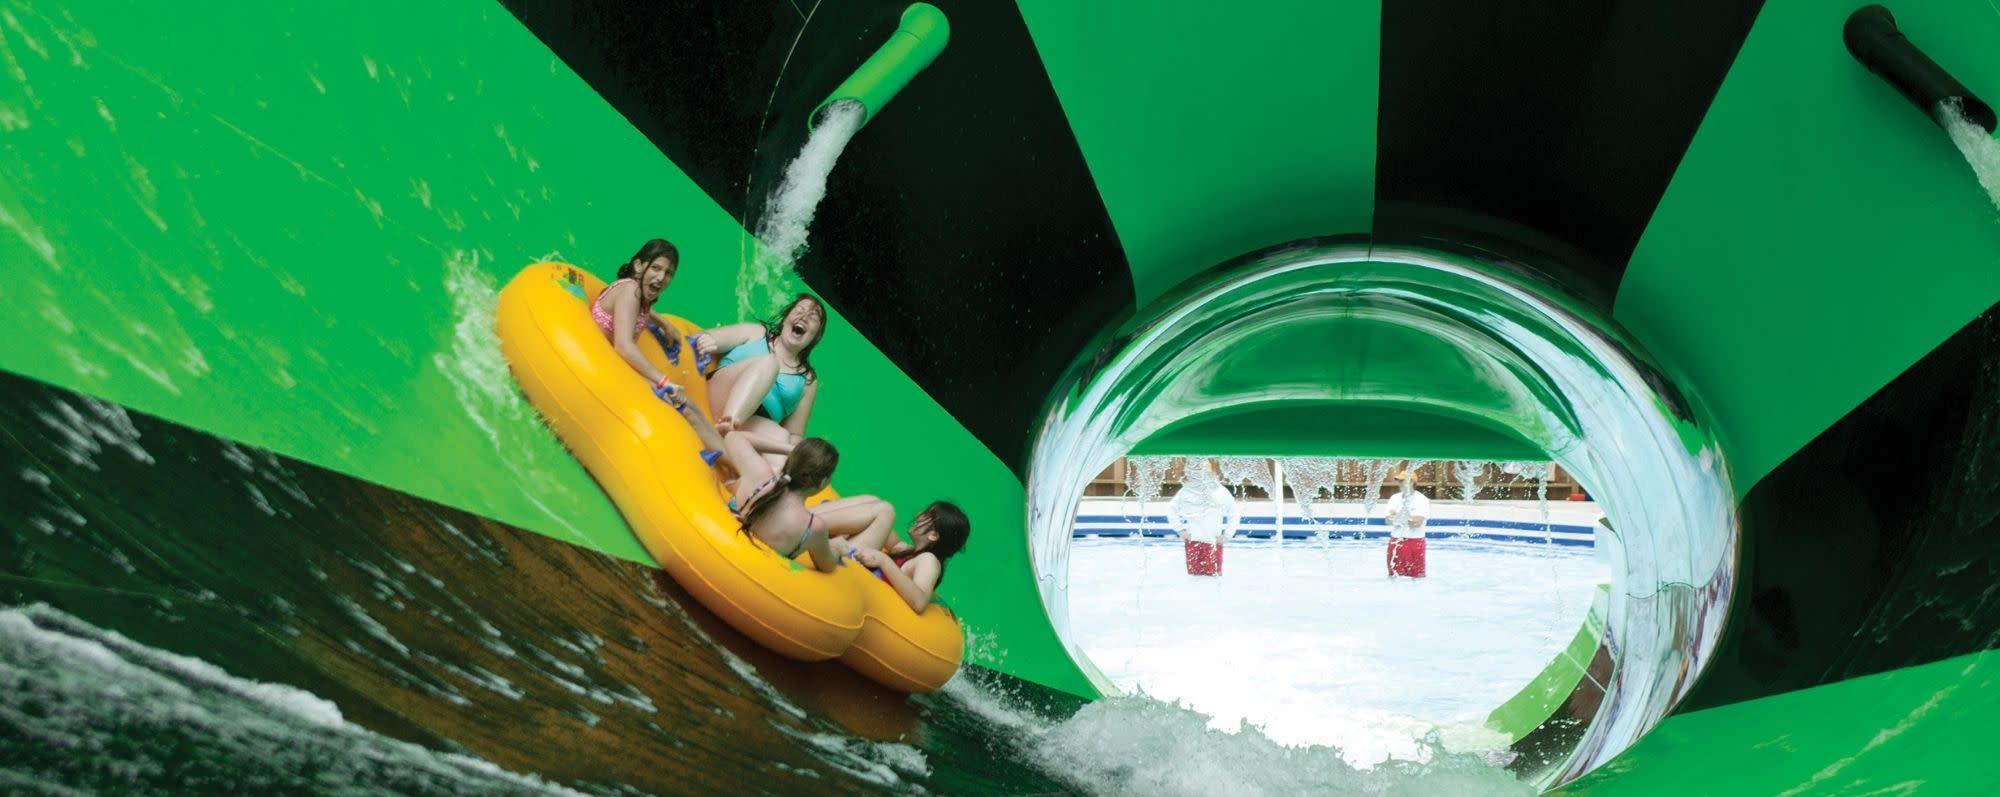 Four people ride the Alien Invasion water slide at Splish Splash Water Park